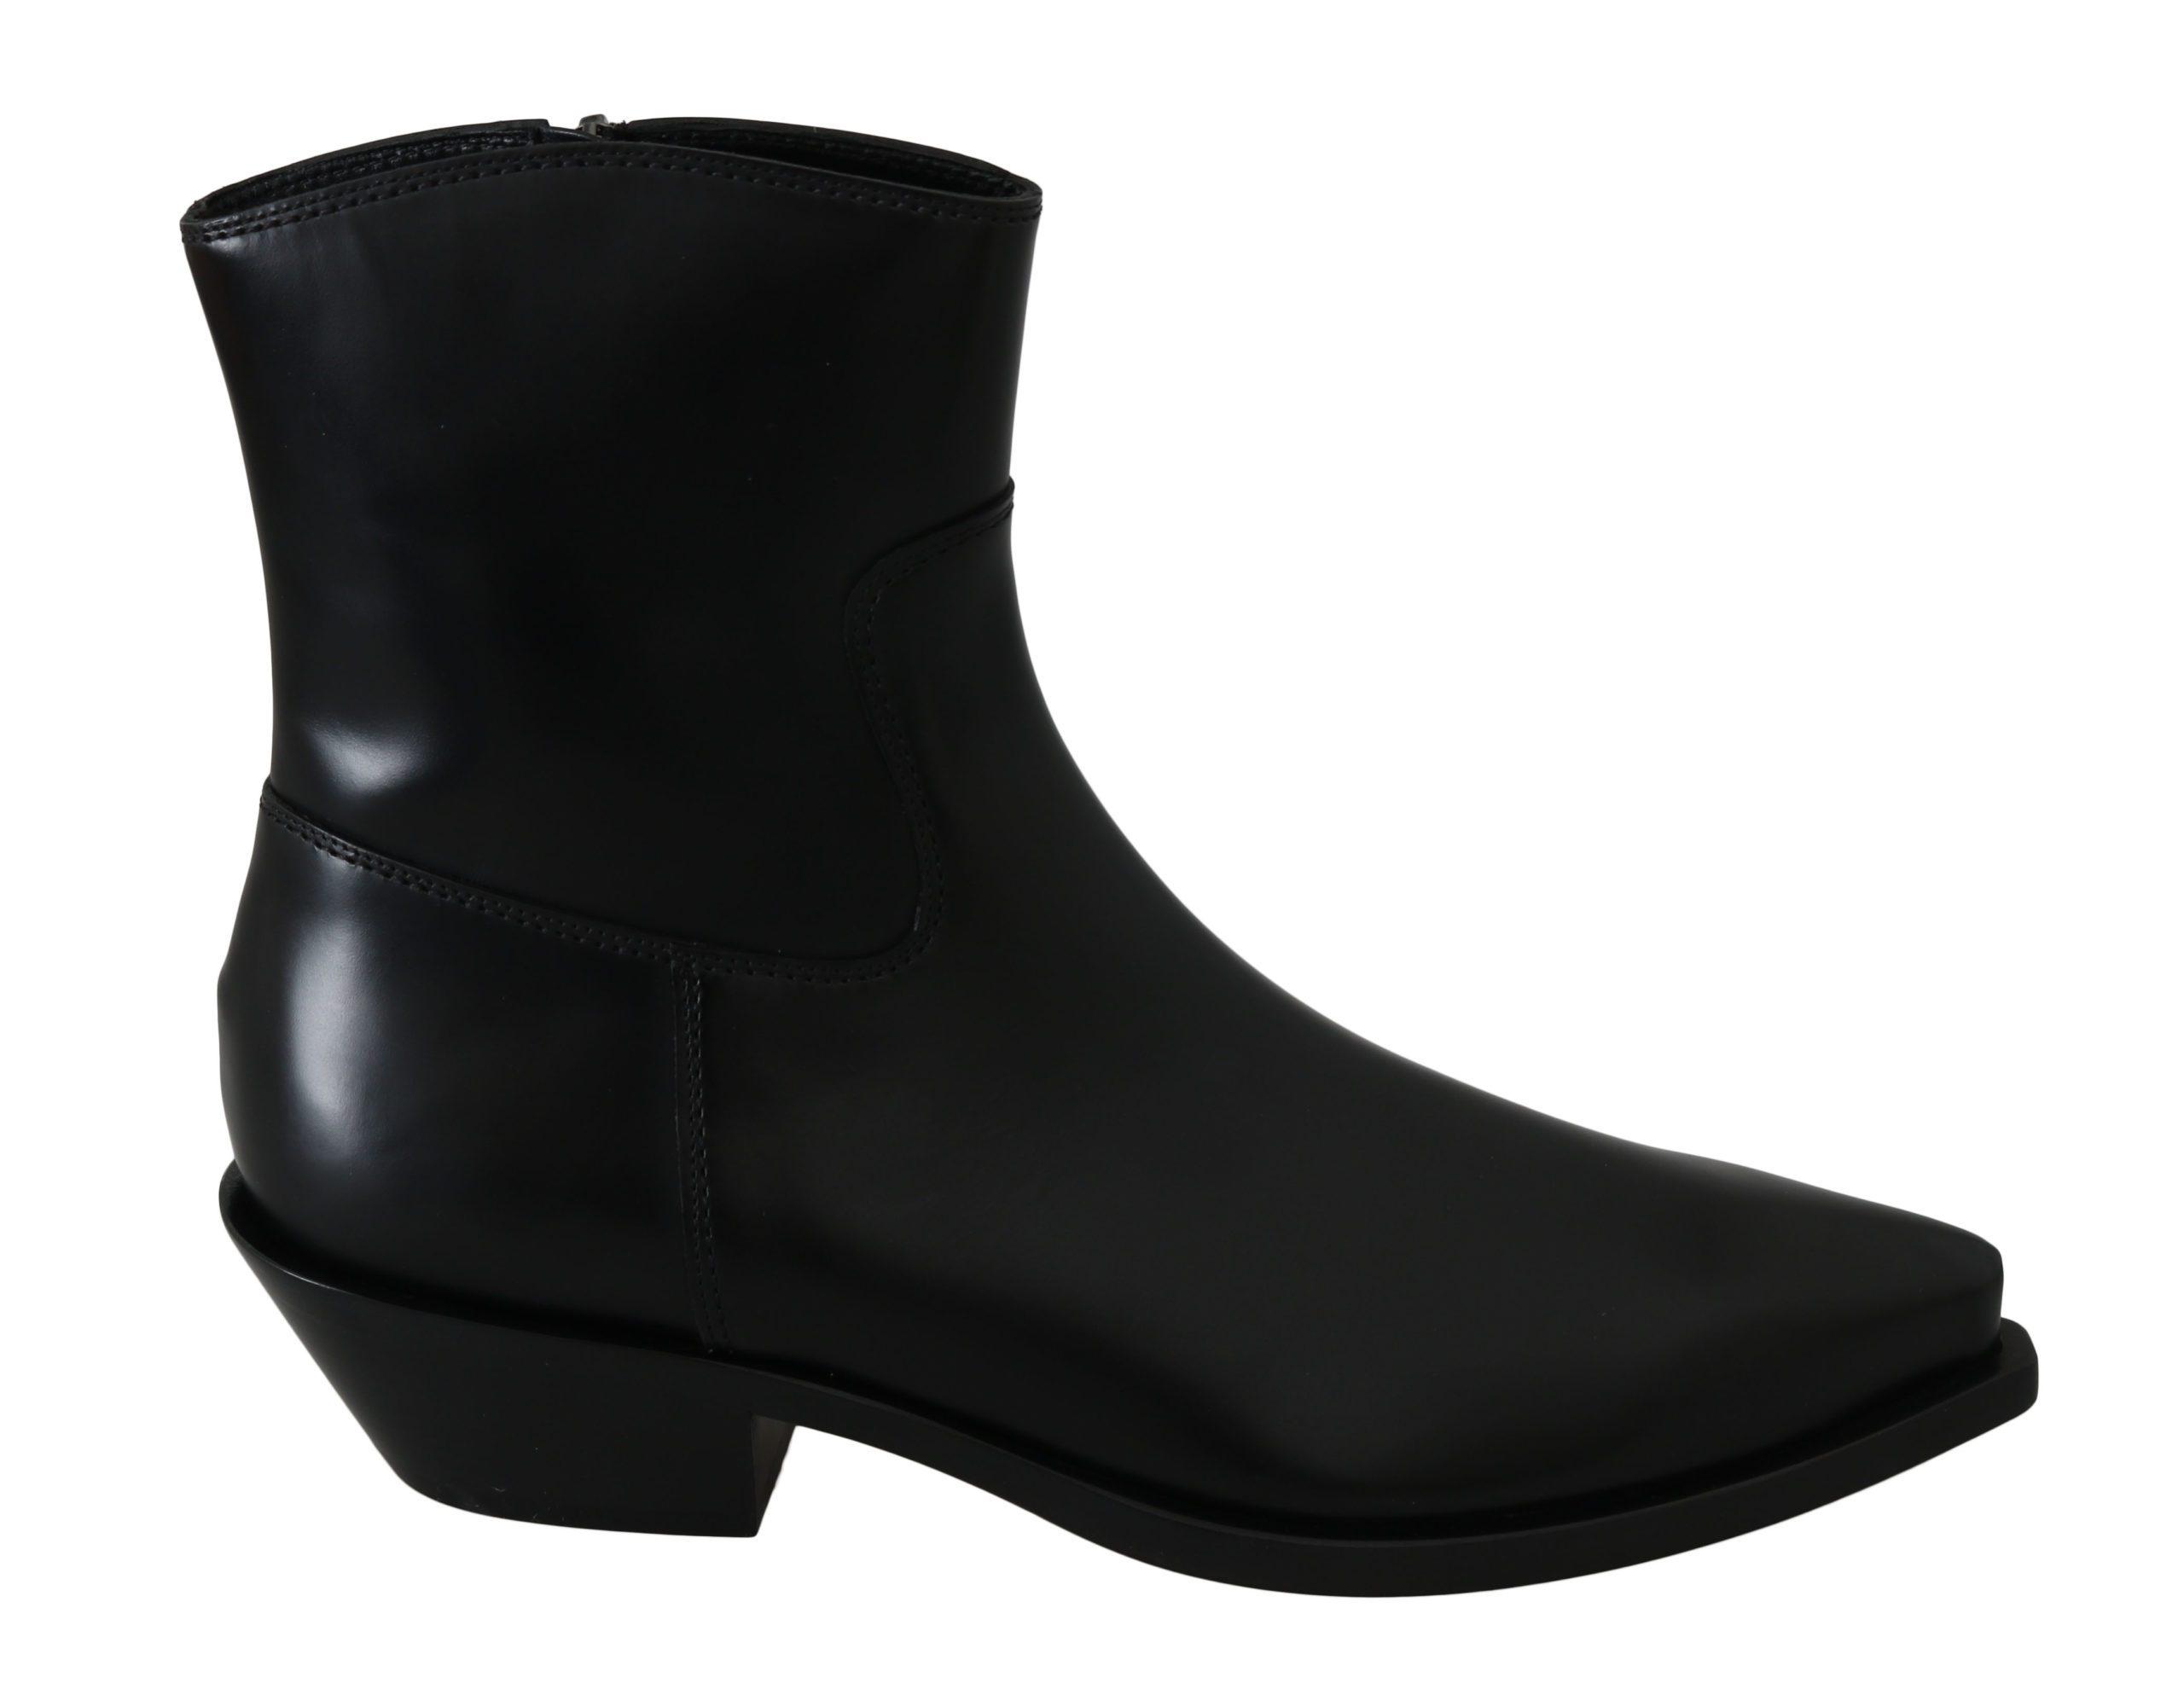 Dolce & Gabbana Women's Leather Ankle High Boots Black LA6305 - EU39/US8.5